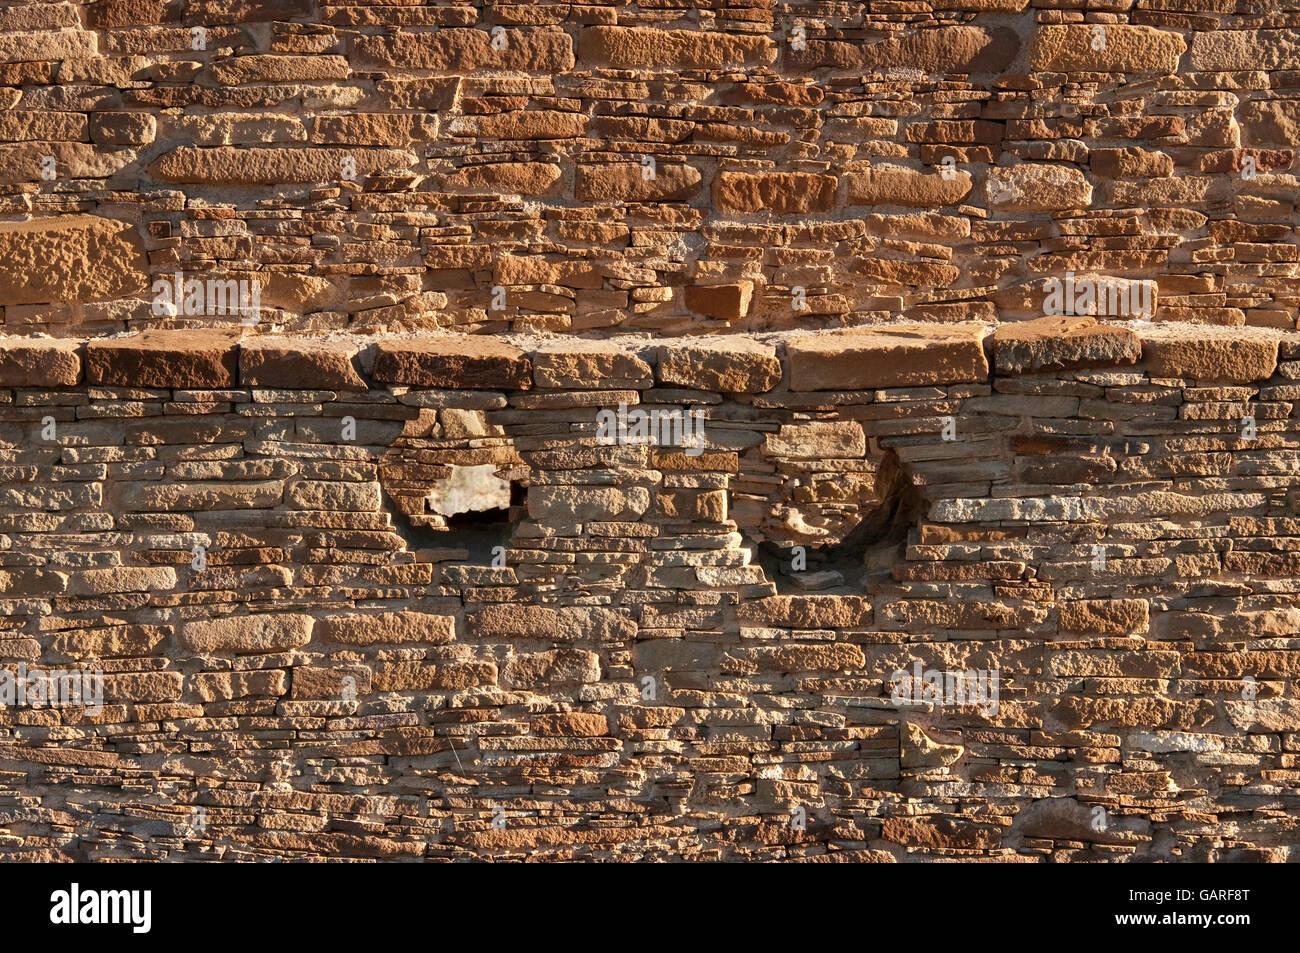 Wall with masonry details, Chetro Ketl ruins, Chaco Culture National Historical Park, New Mexico, USA Stock Photo